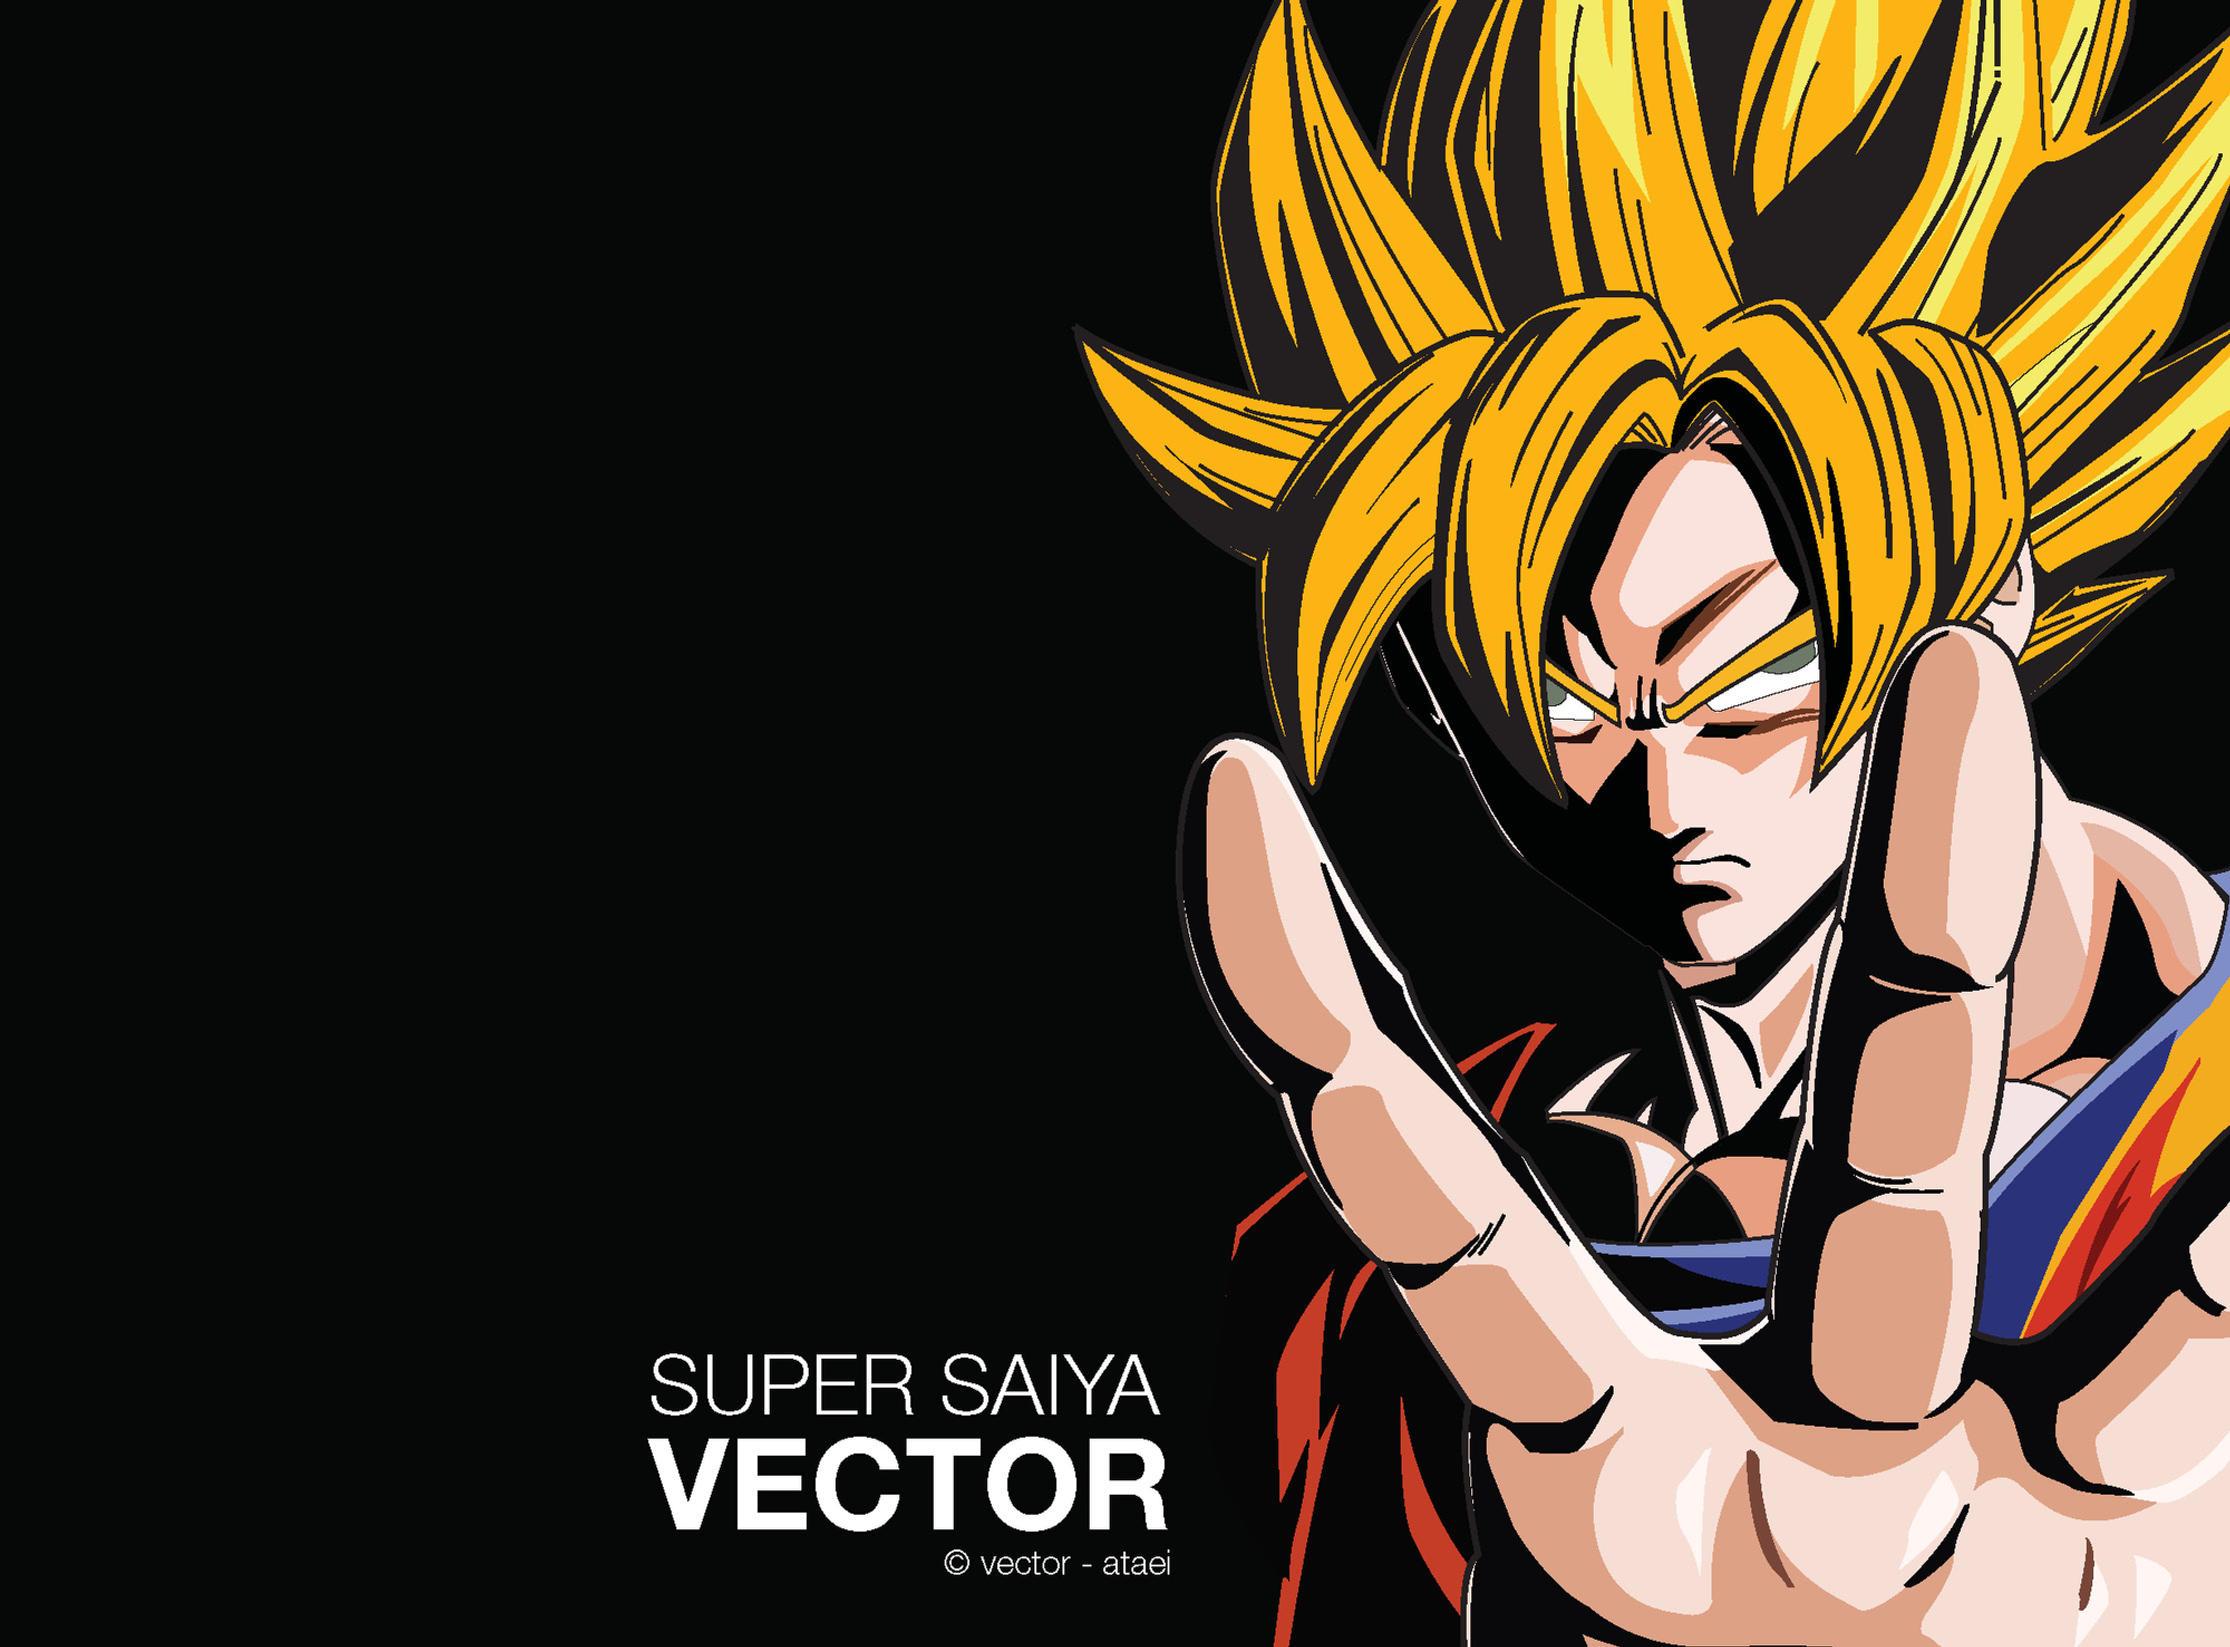 goku super saiya: